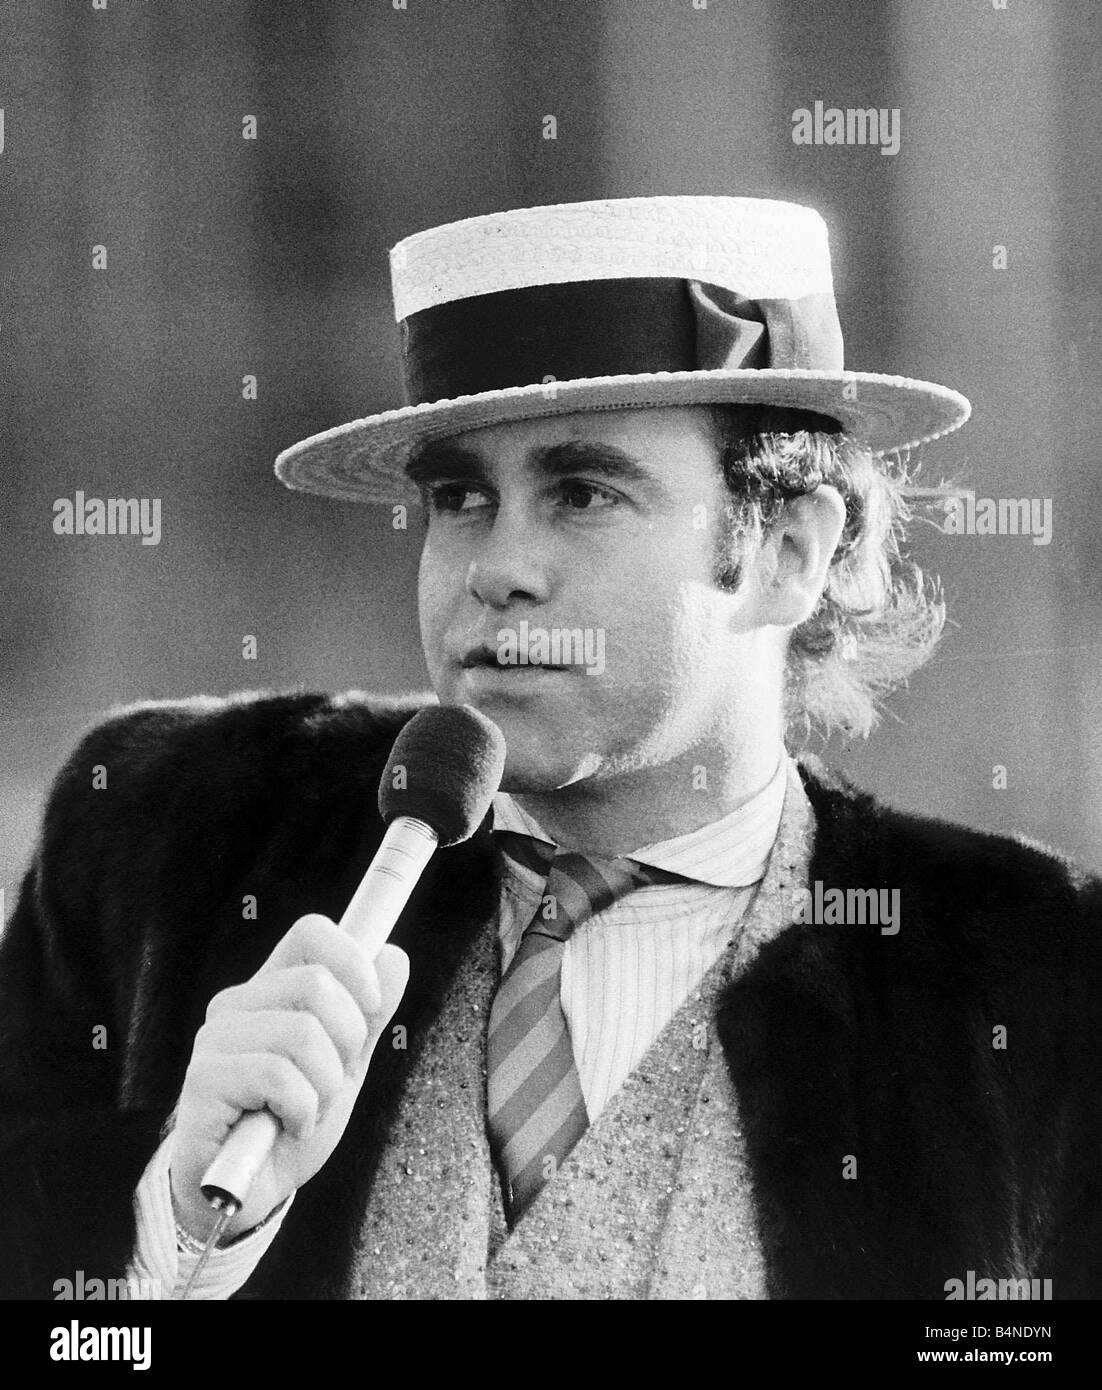 Elton John Black And White Stock Photos Amp Images Alamy